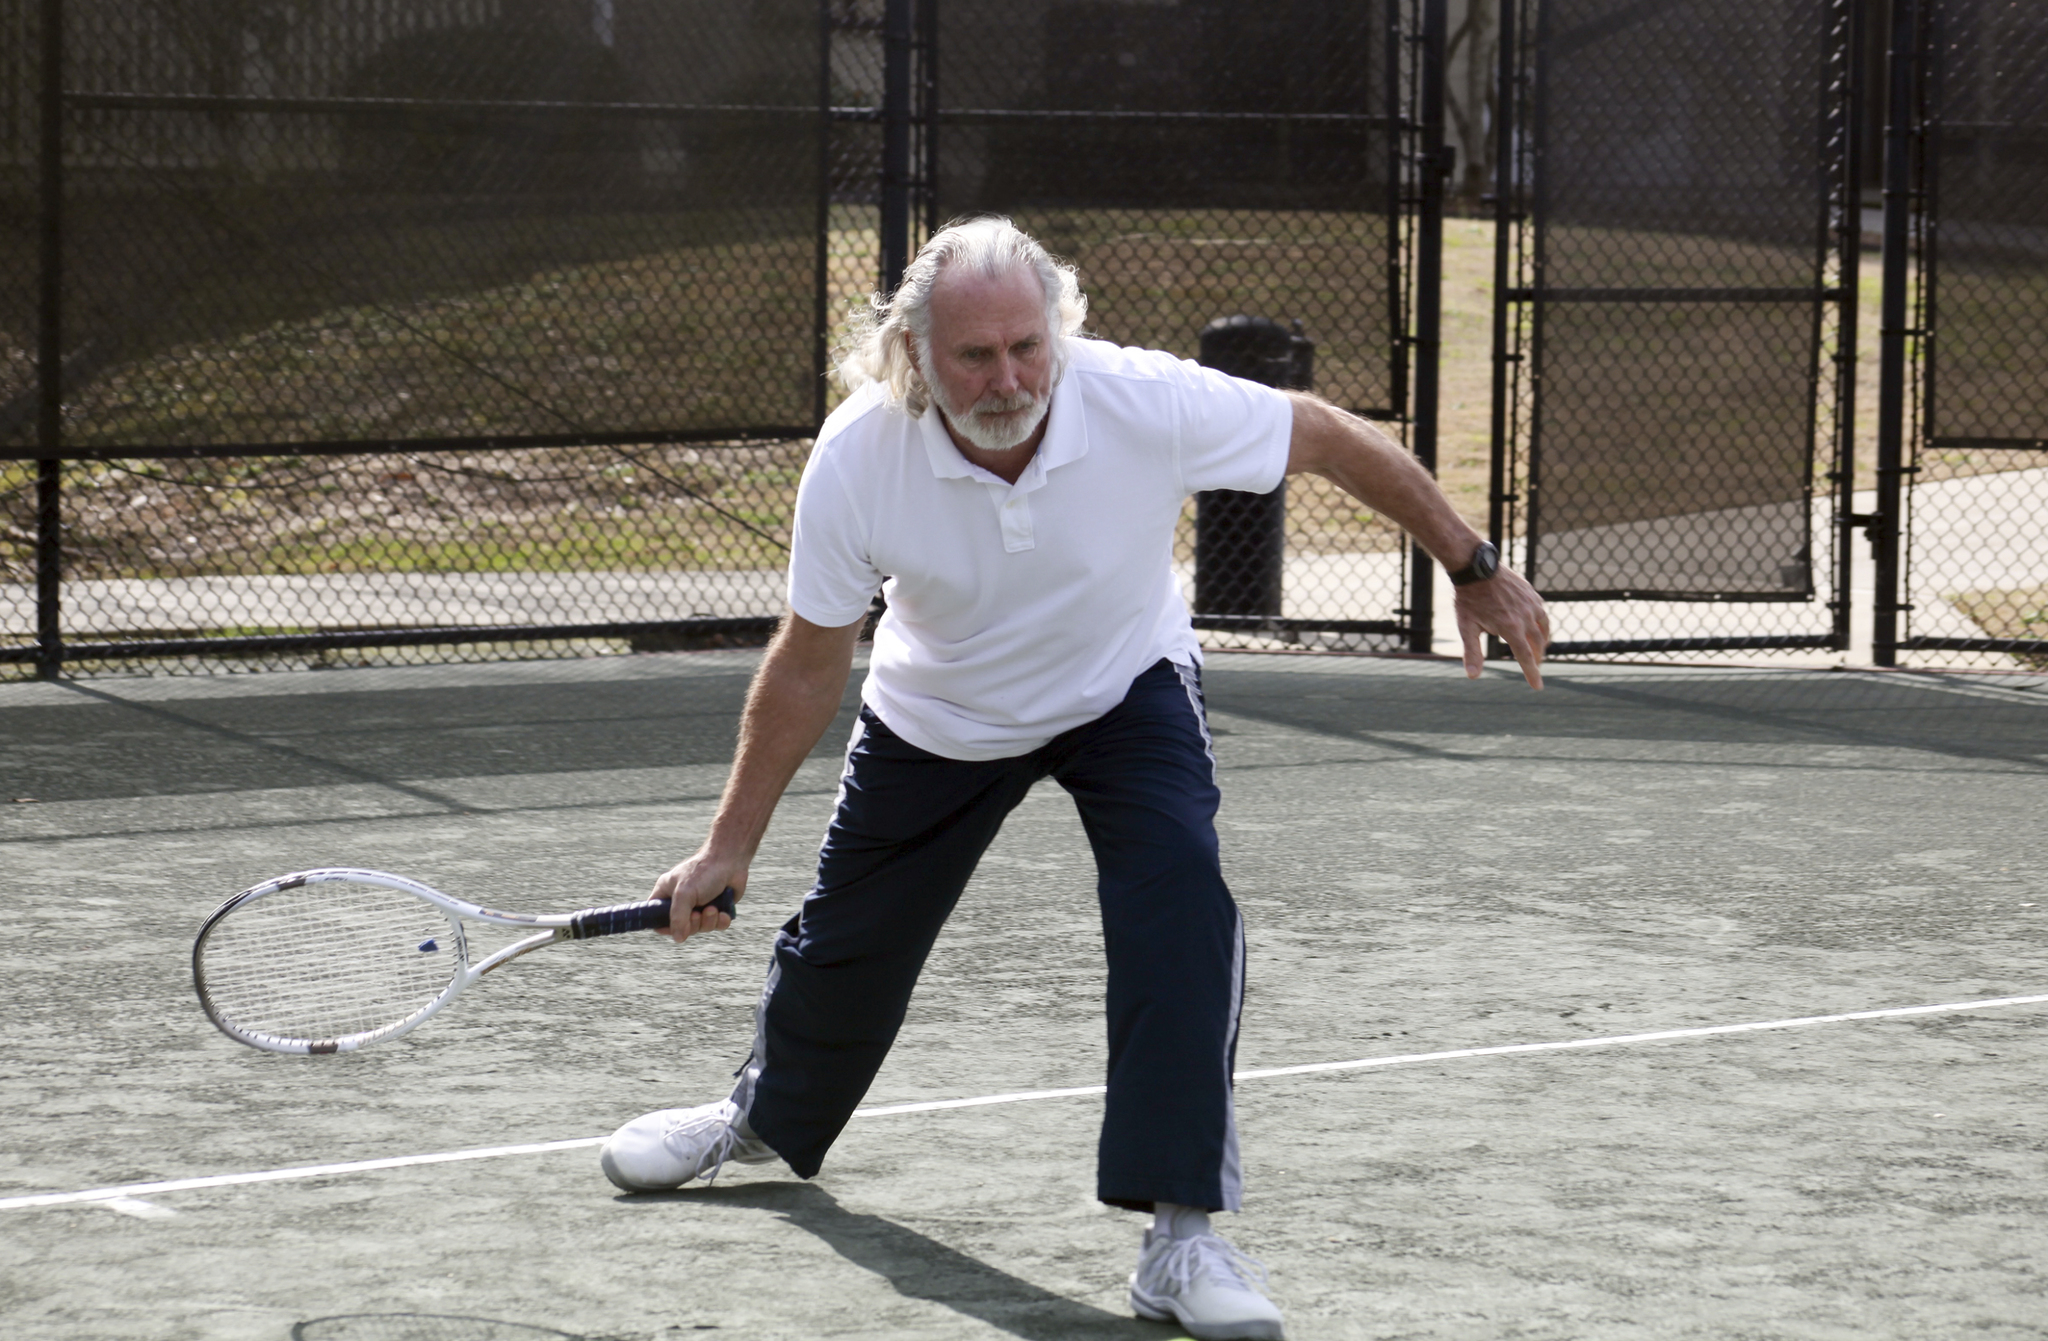 Man hitting a tennis ball.